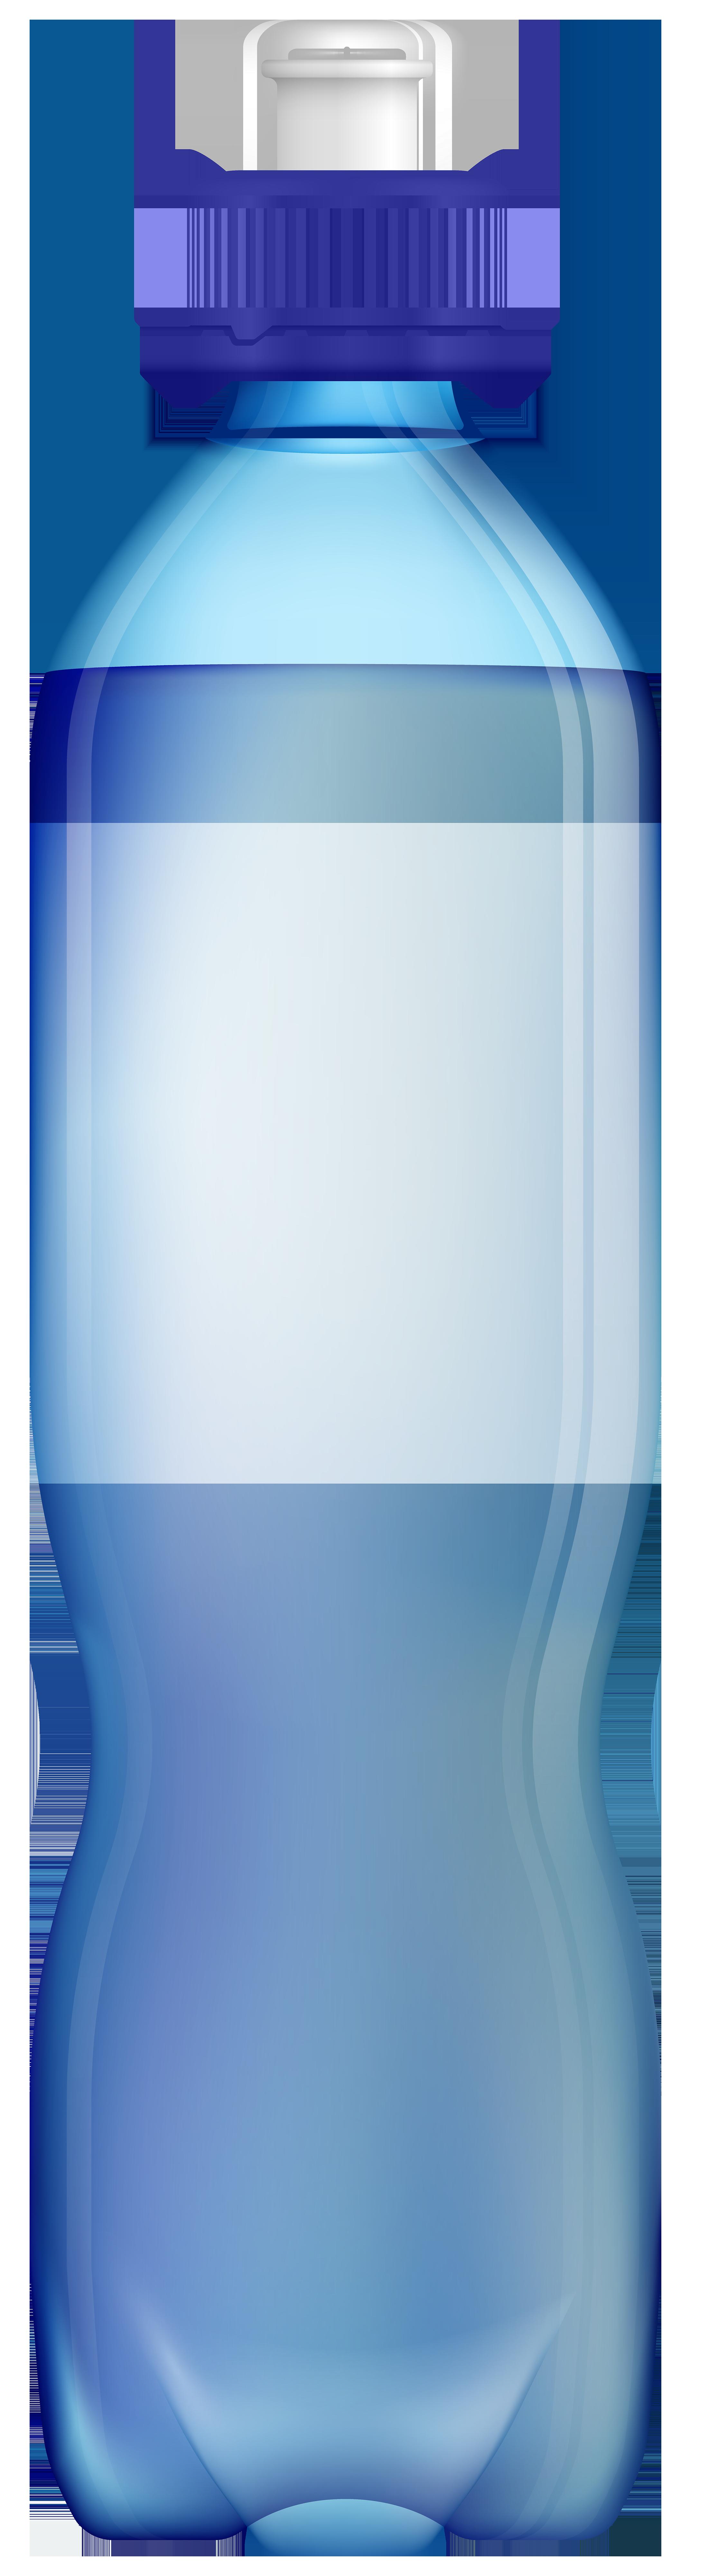 jpg transparent library Water bottle Clip art